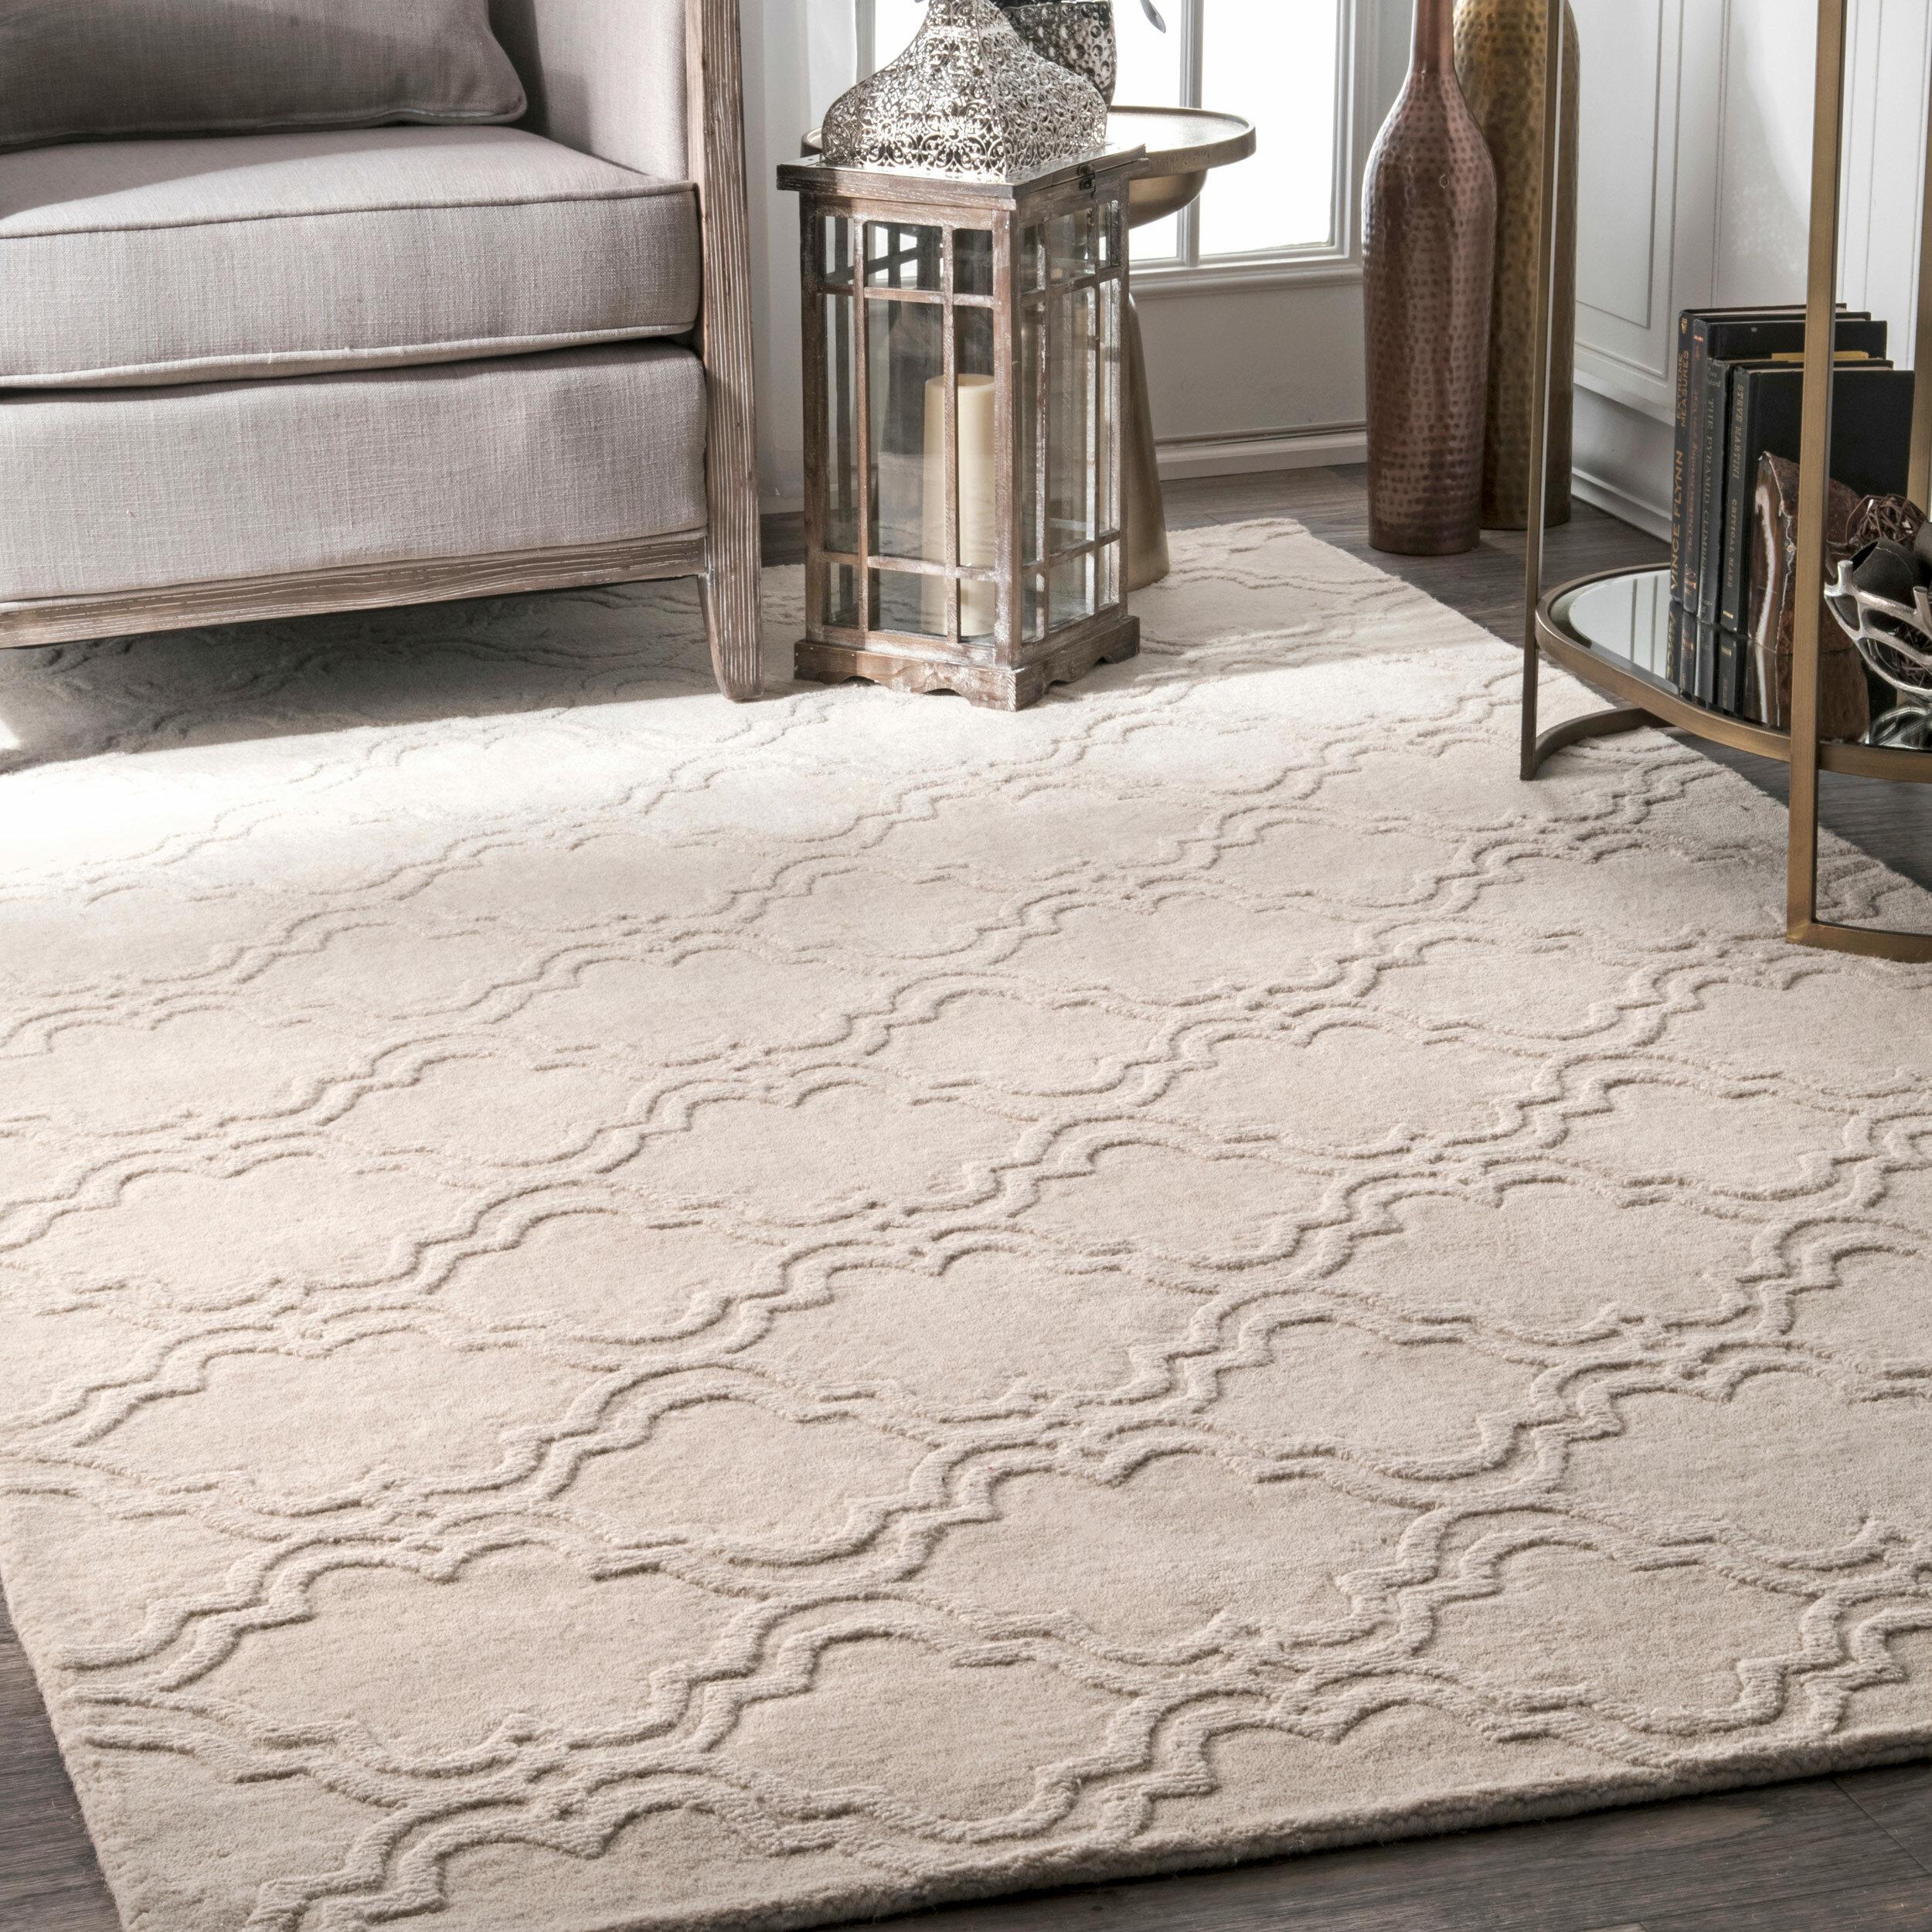 Godwin Geometric Handmade Tufted Wool Ivory Area Rug Reviews Birch Lane